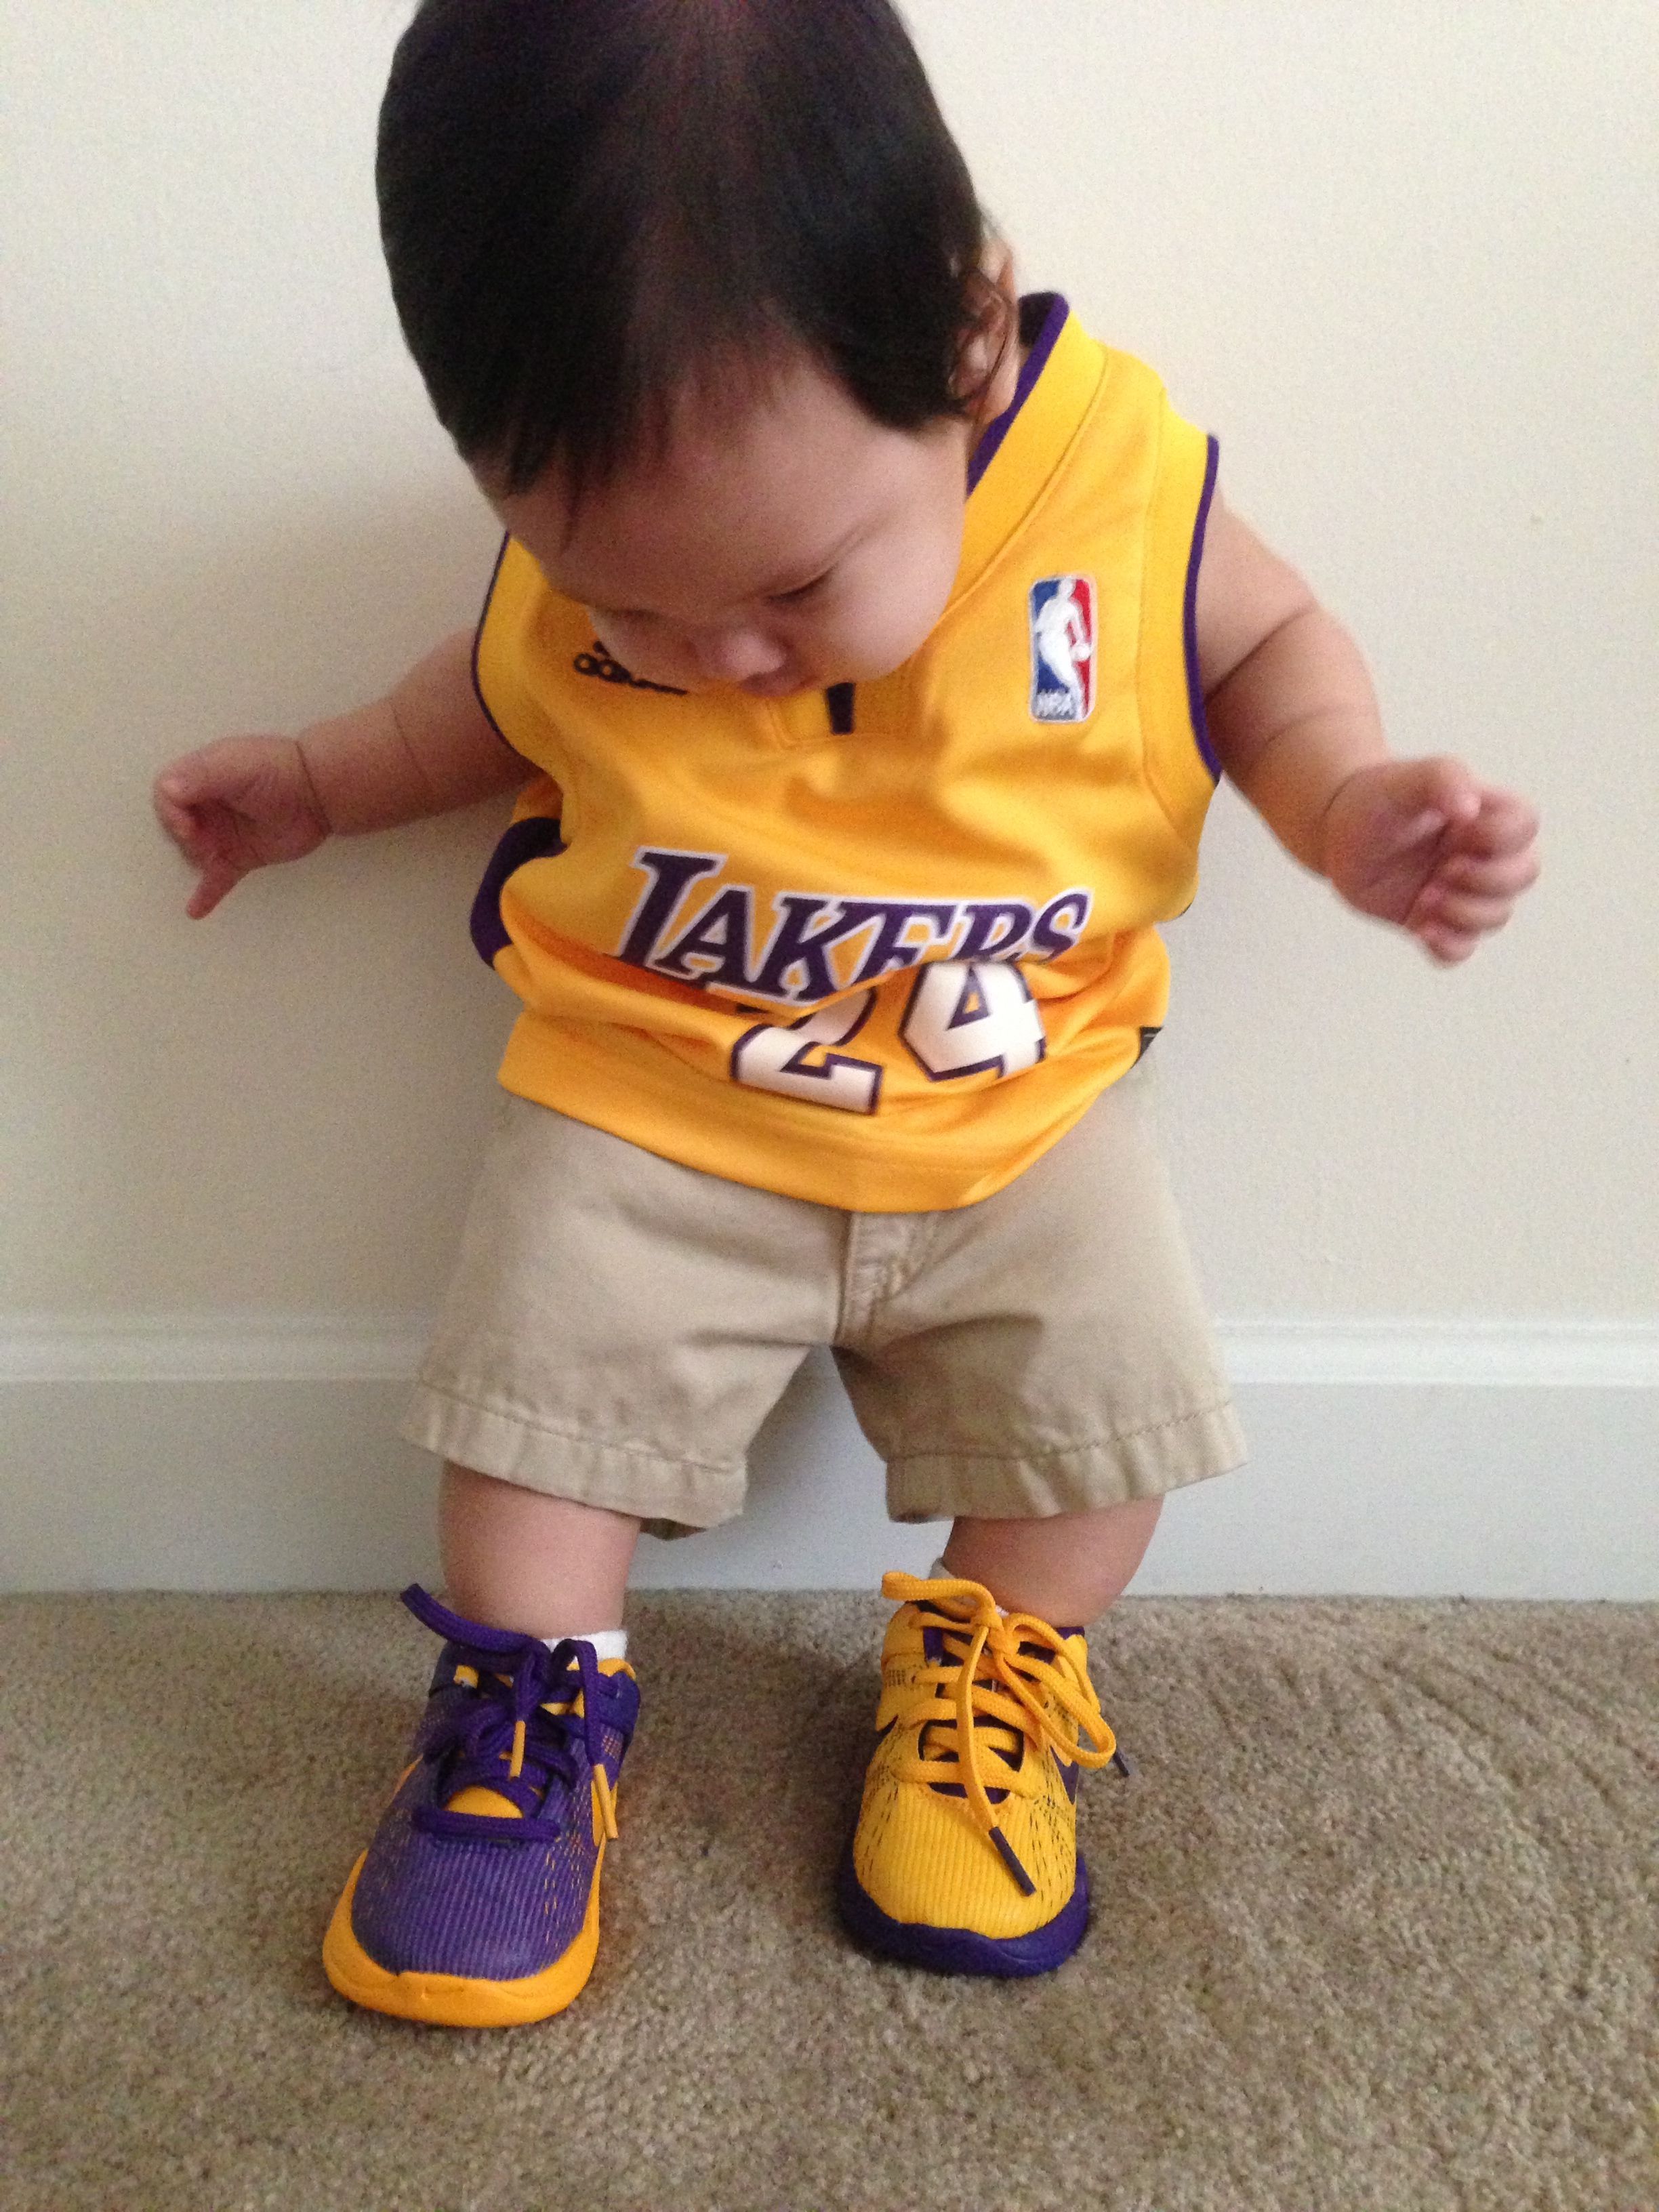 kobe bryant baby shoes off 56% - www